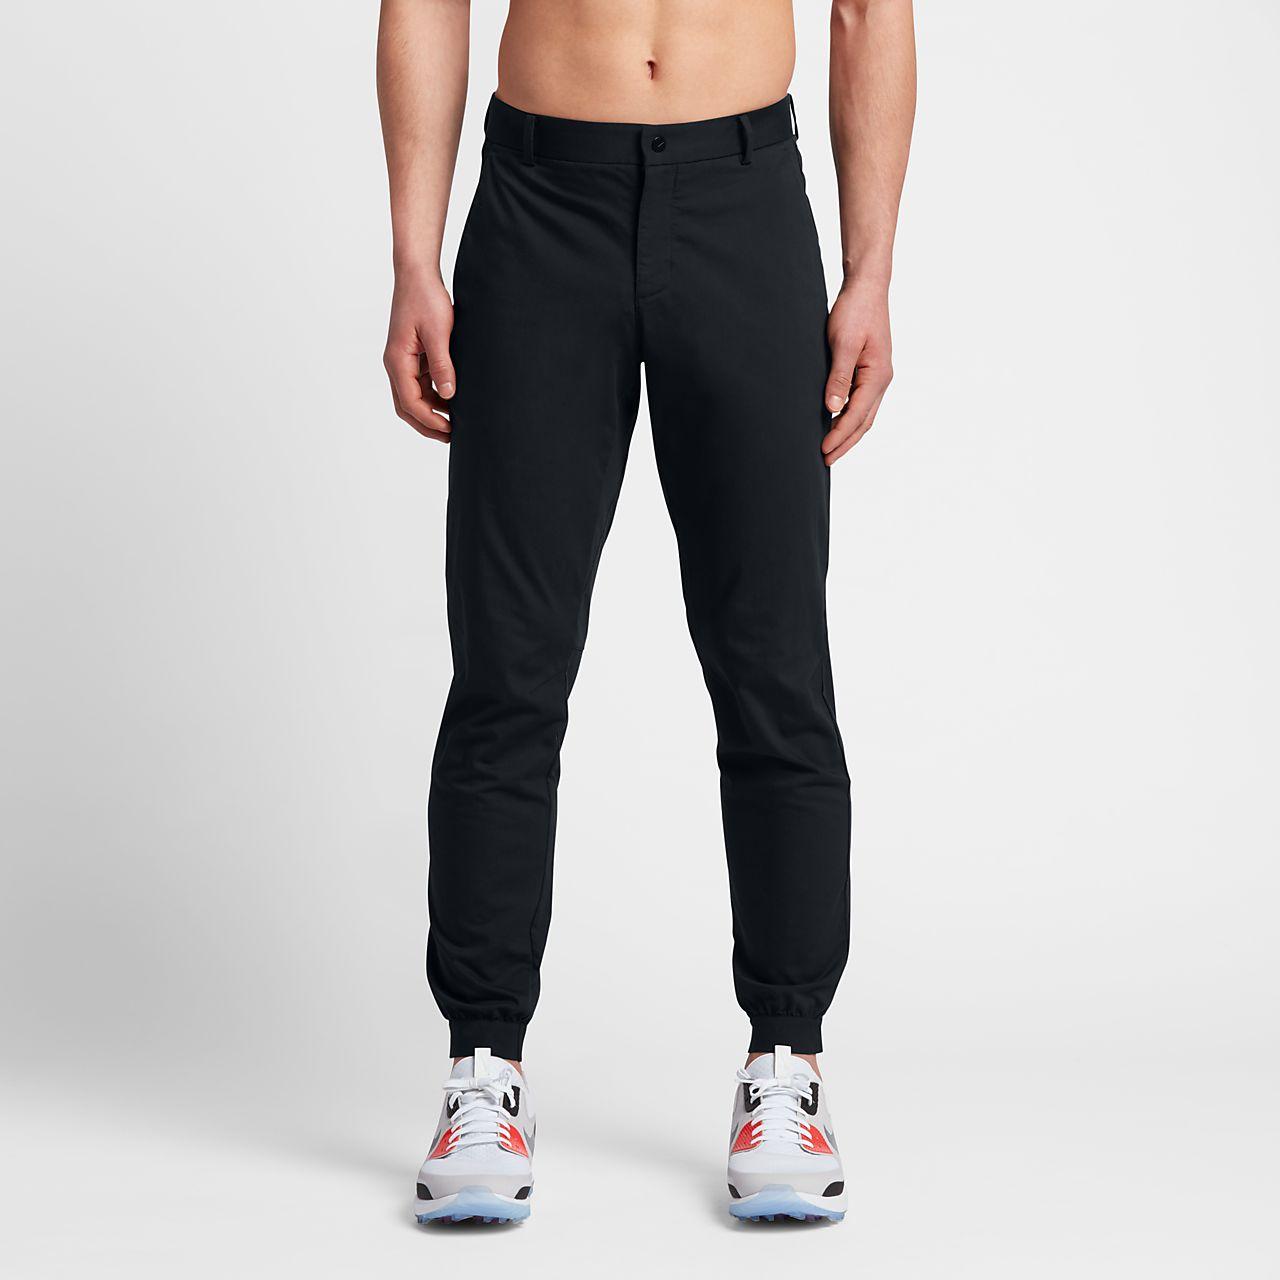 f898d42d6 Nike Joggers Pants For Men unit4motors.co.uk